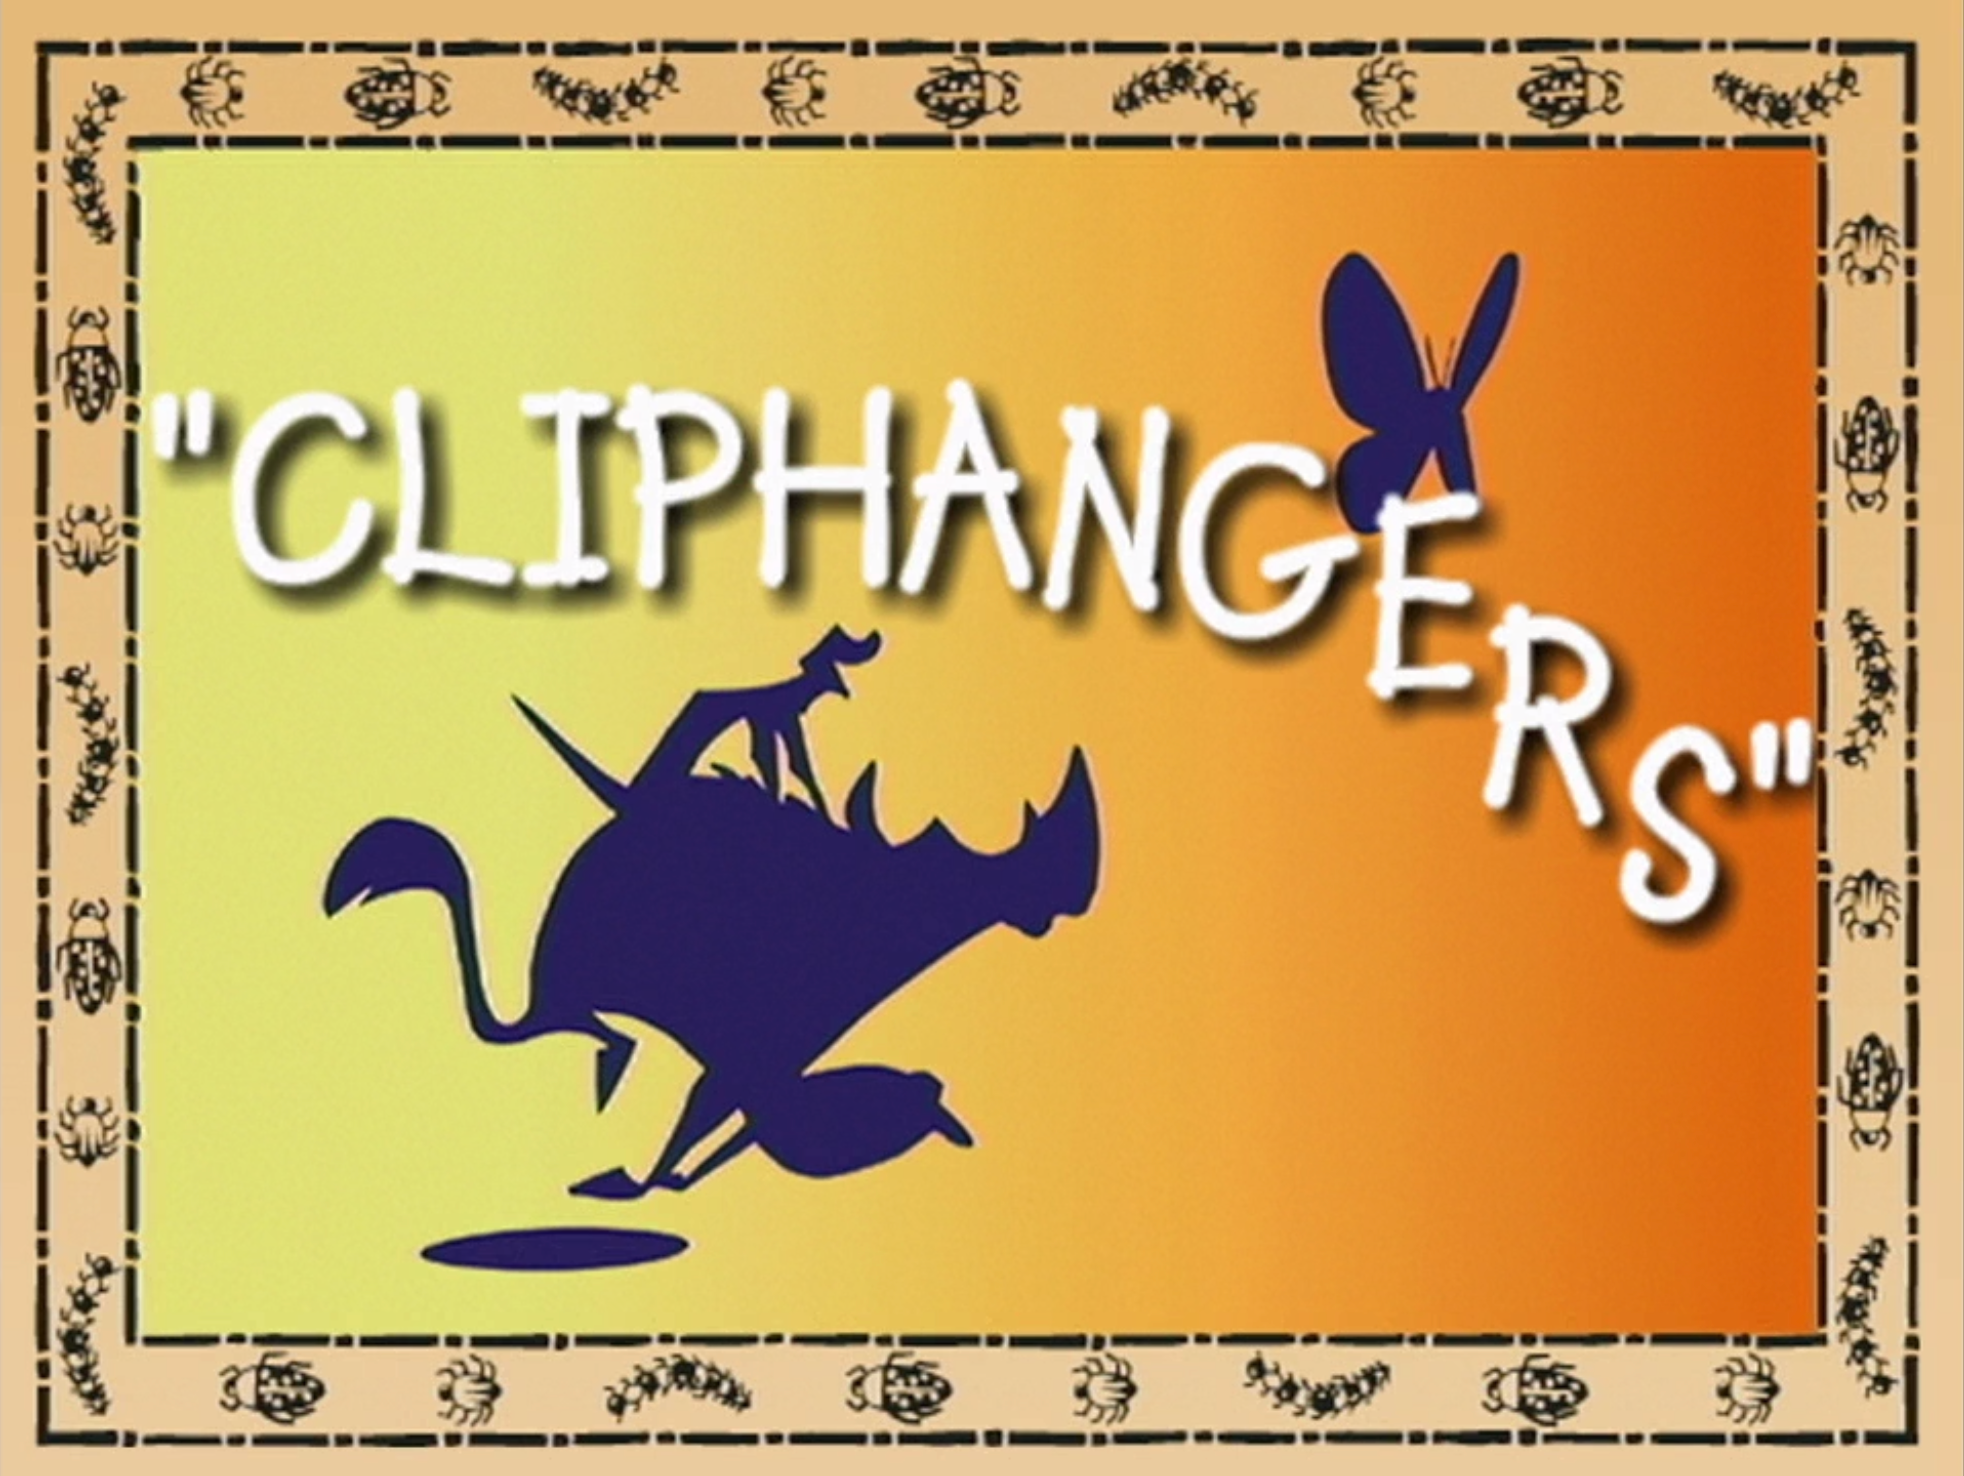 Cliphangers